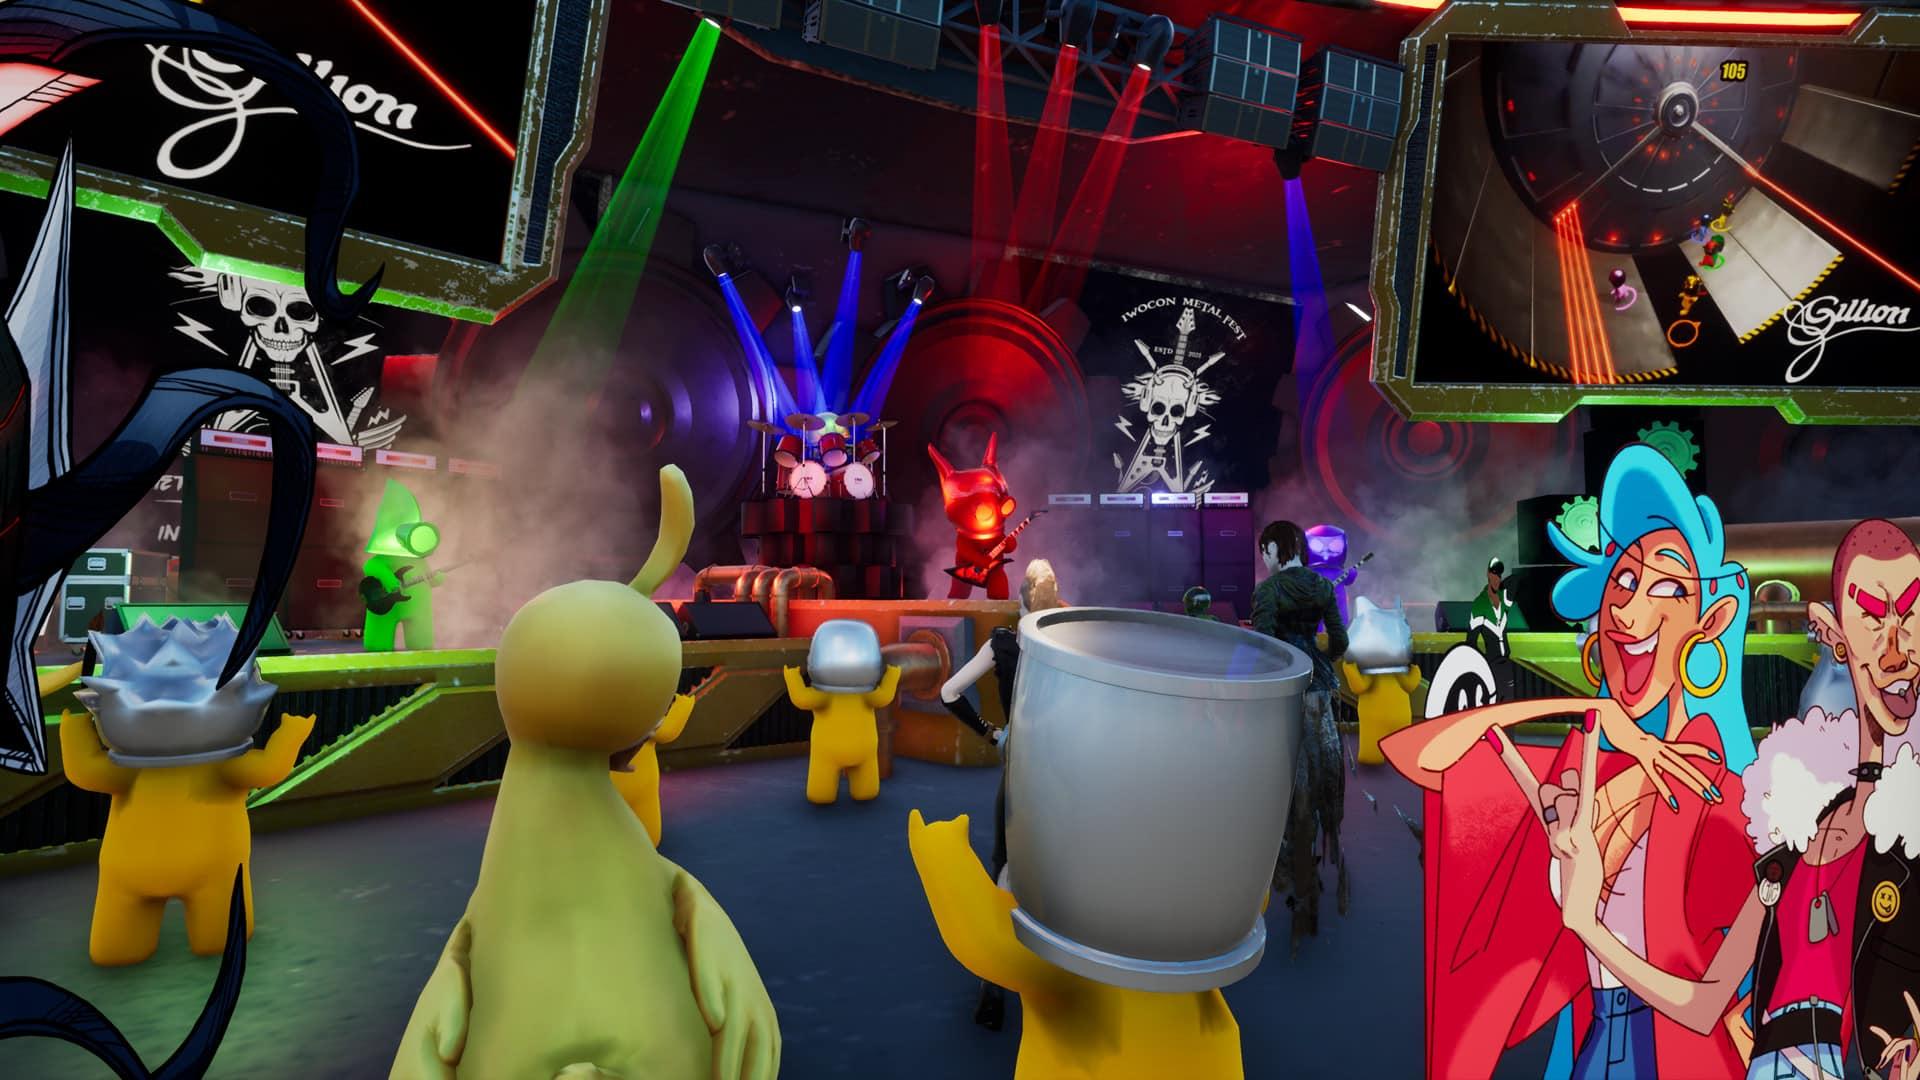 IWOCon 2021 Indie World Order indie trailer digital virtual showcase free game